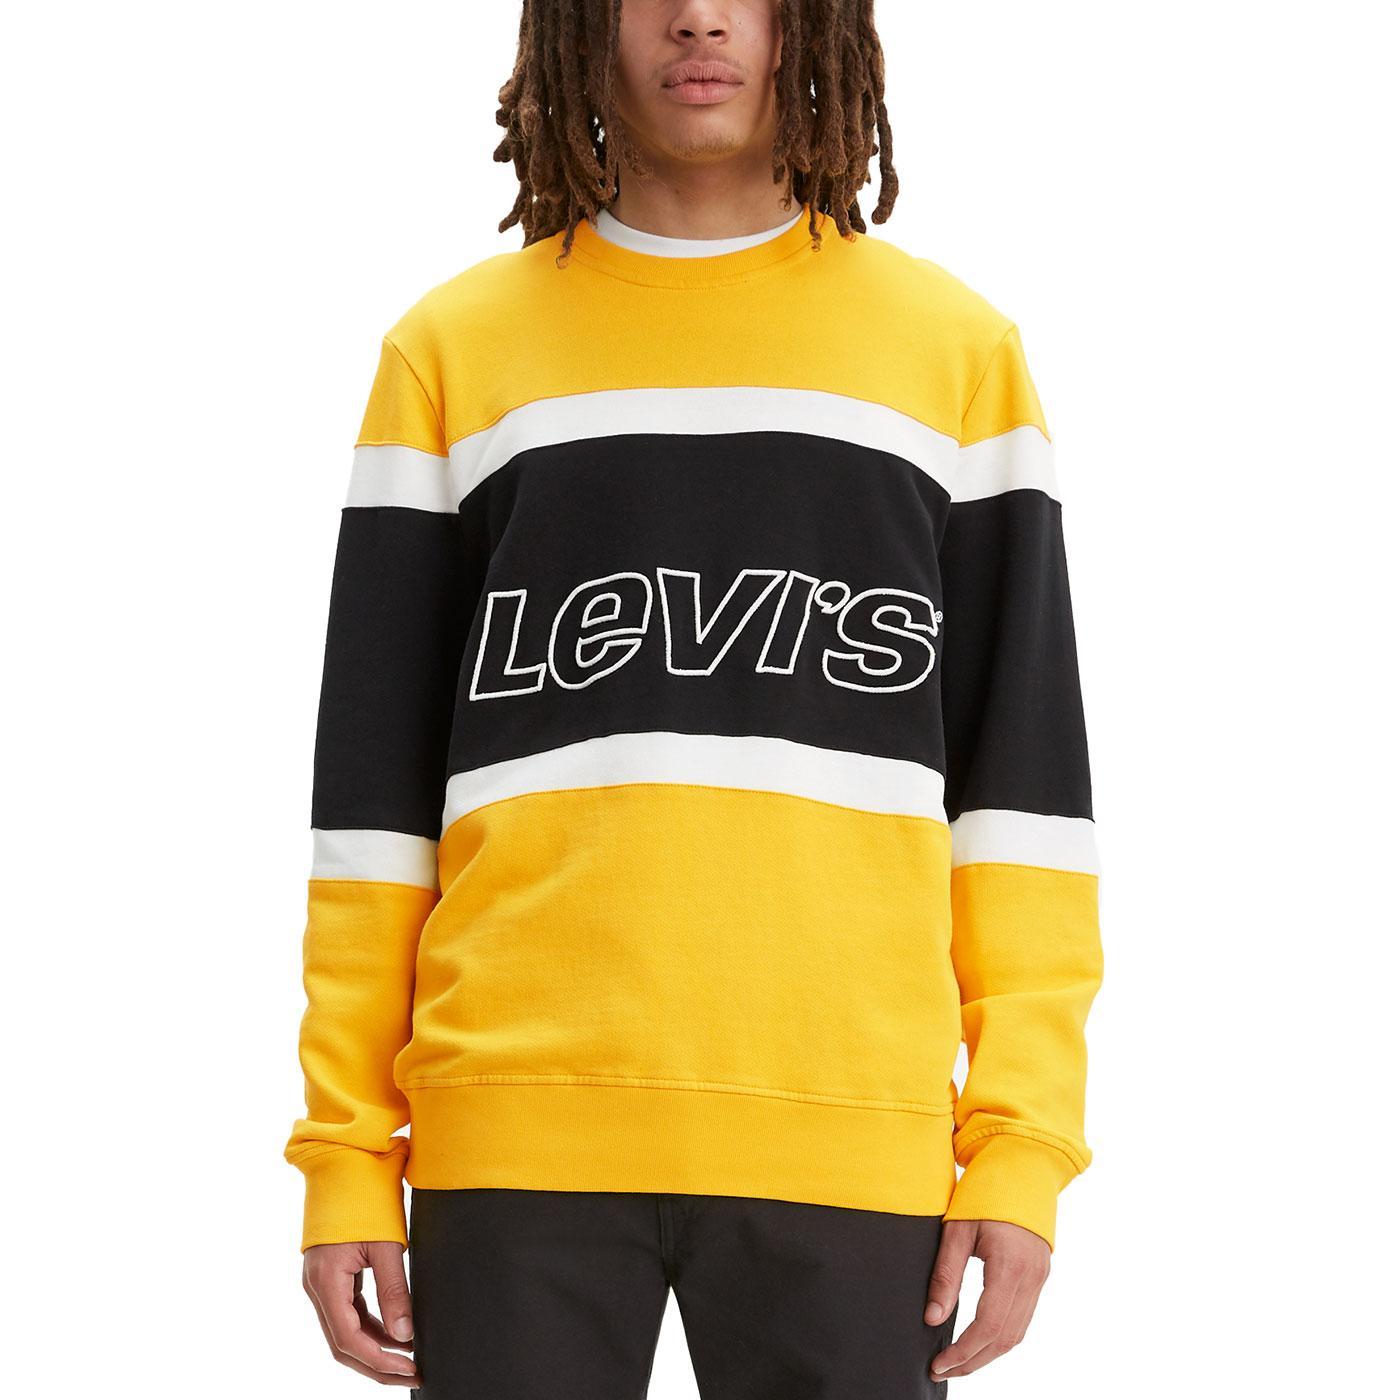 LEVI'S Retro Indie Colour Block Sweatshirt Y/B